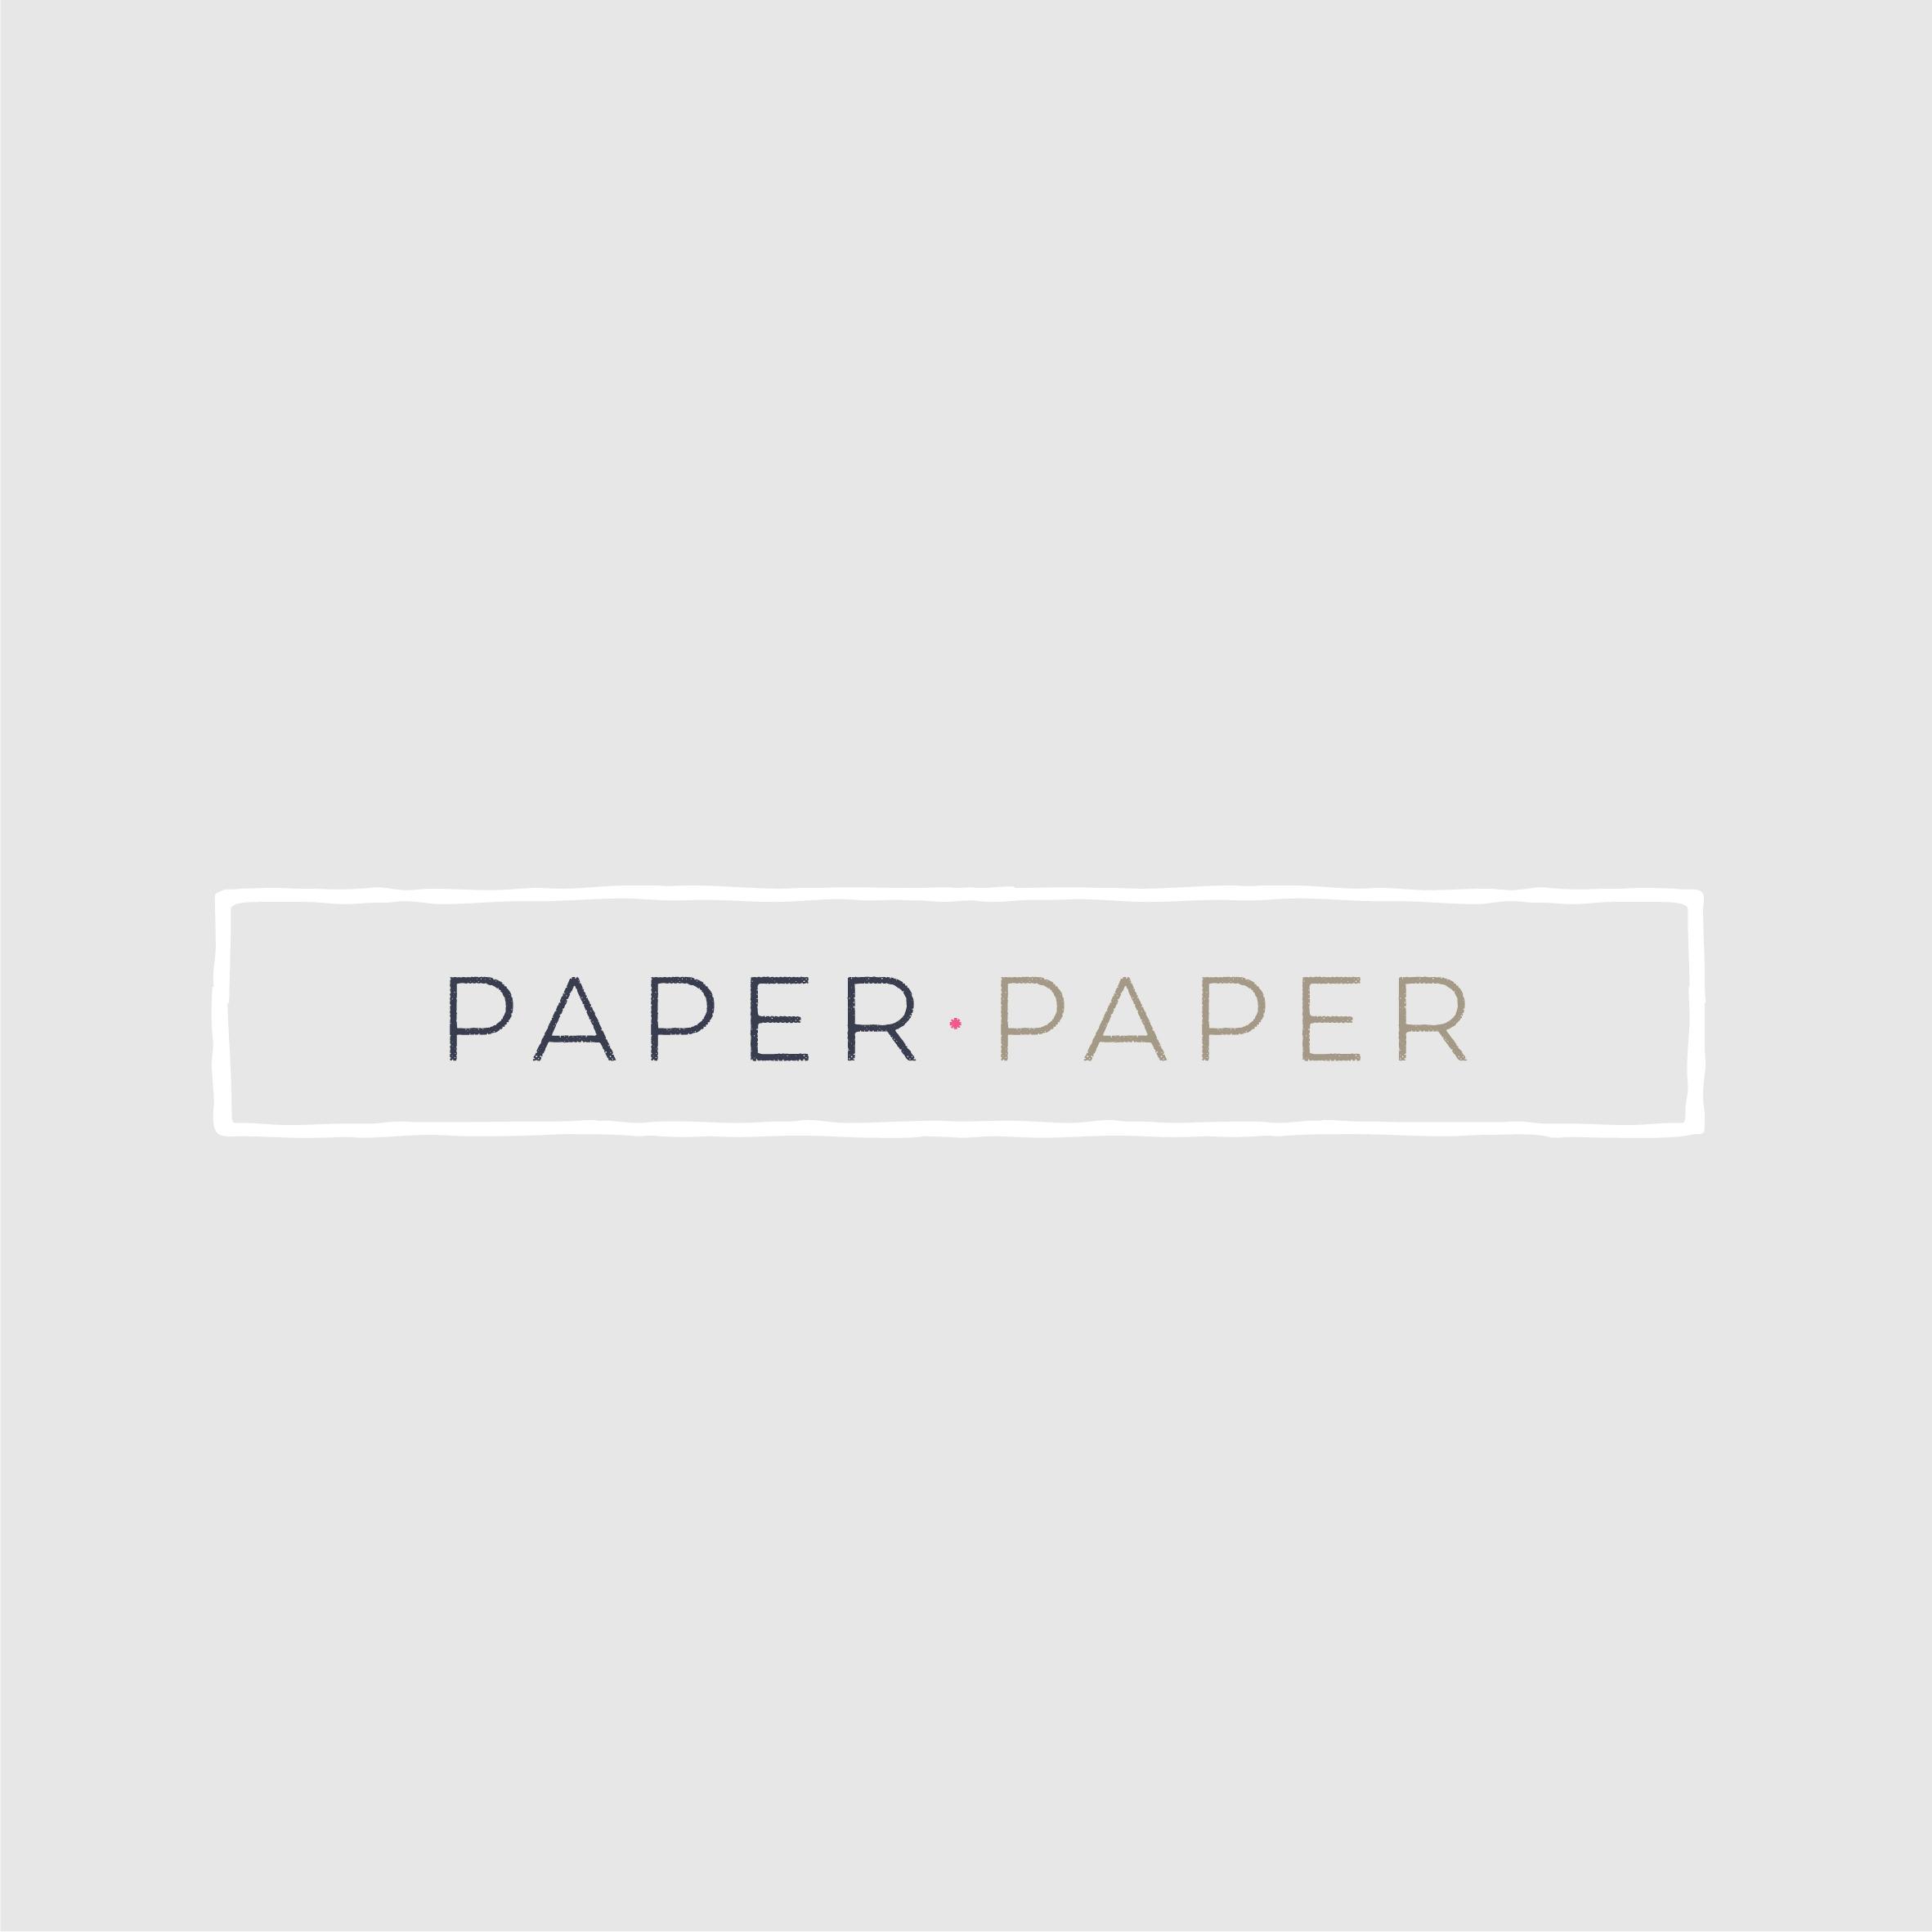 paper paper-02